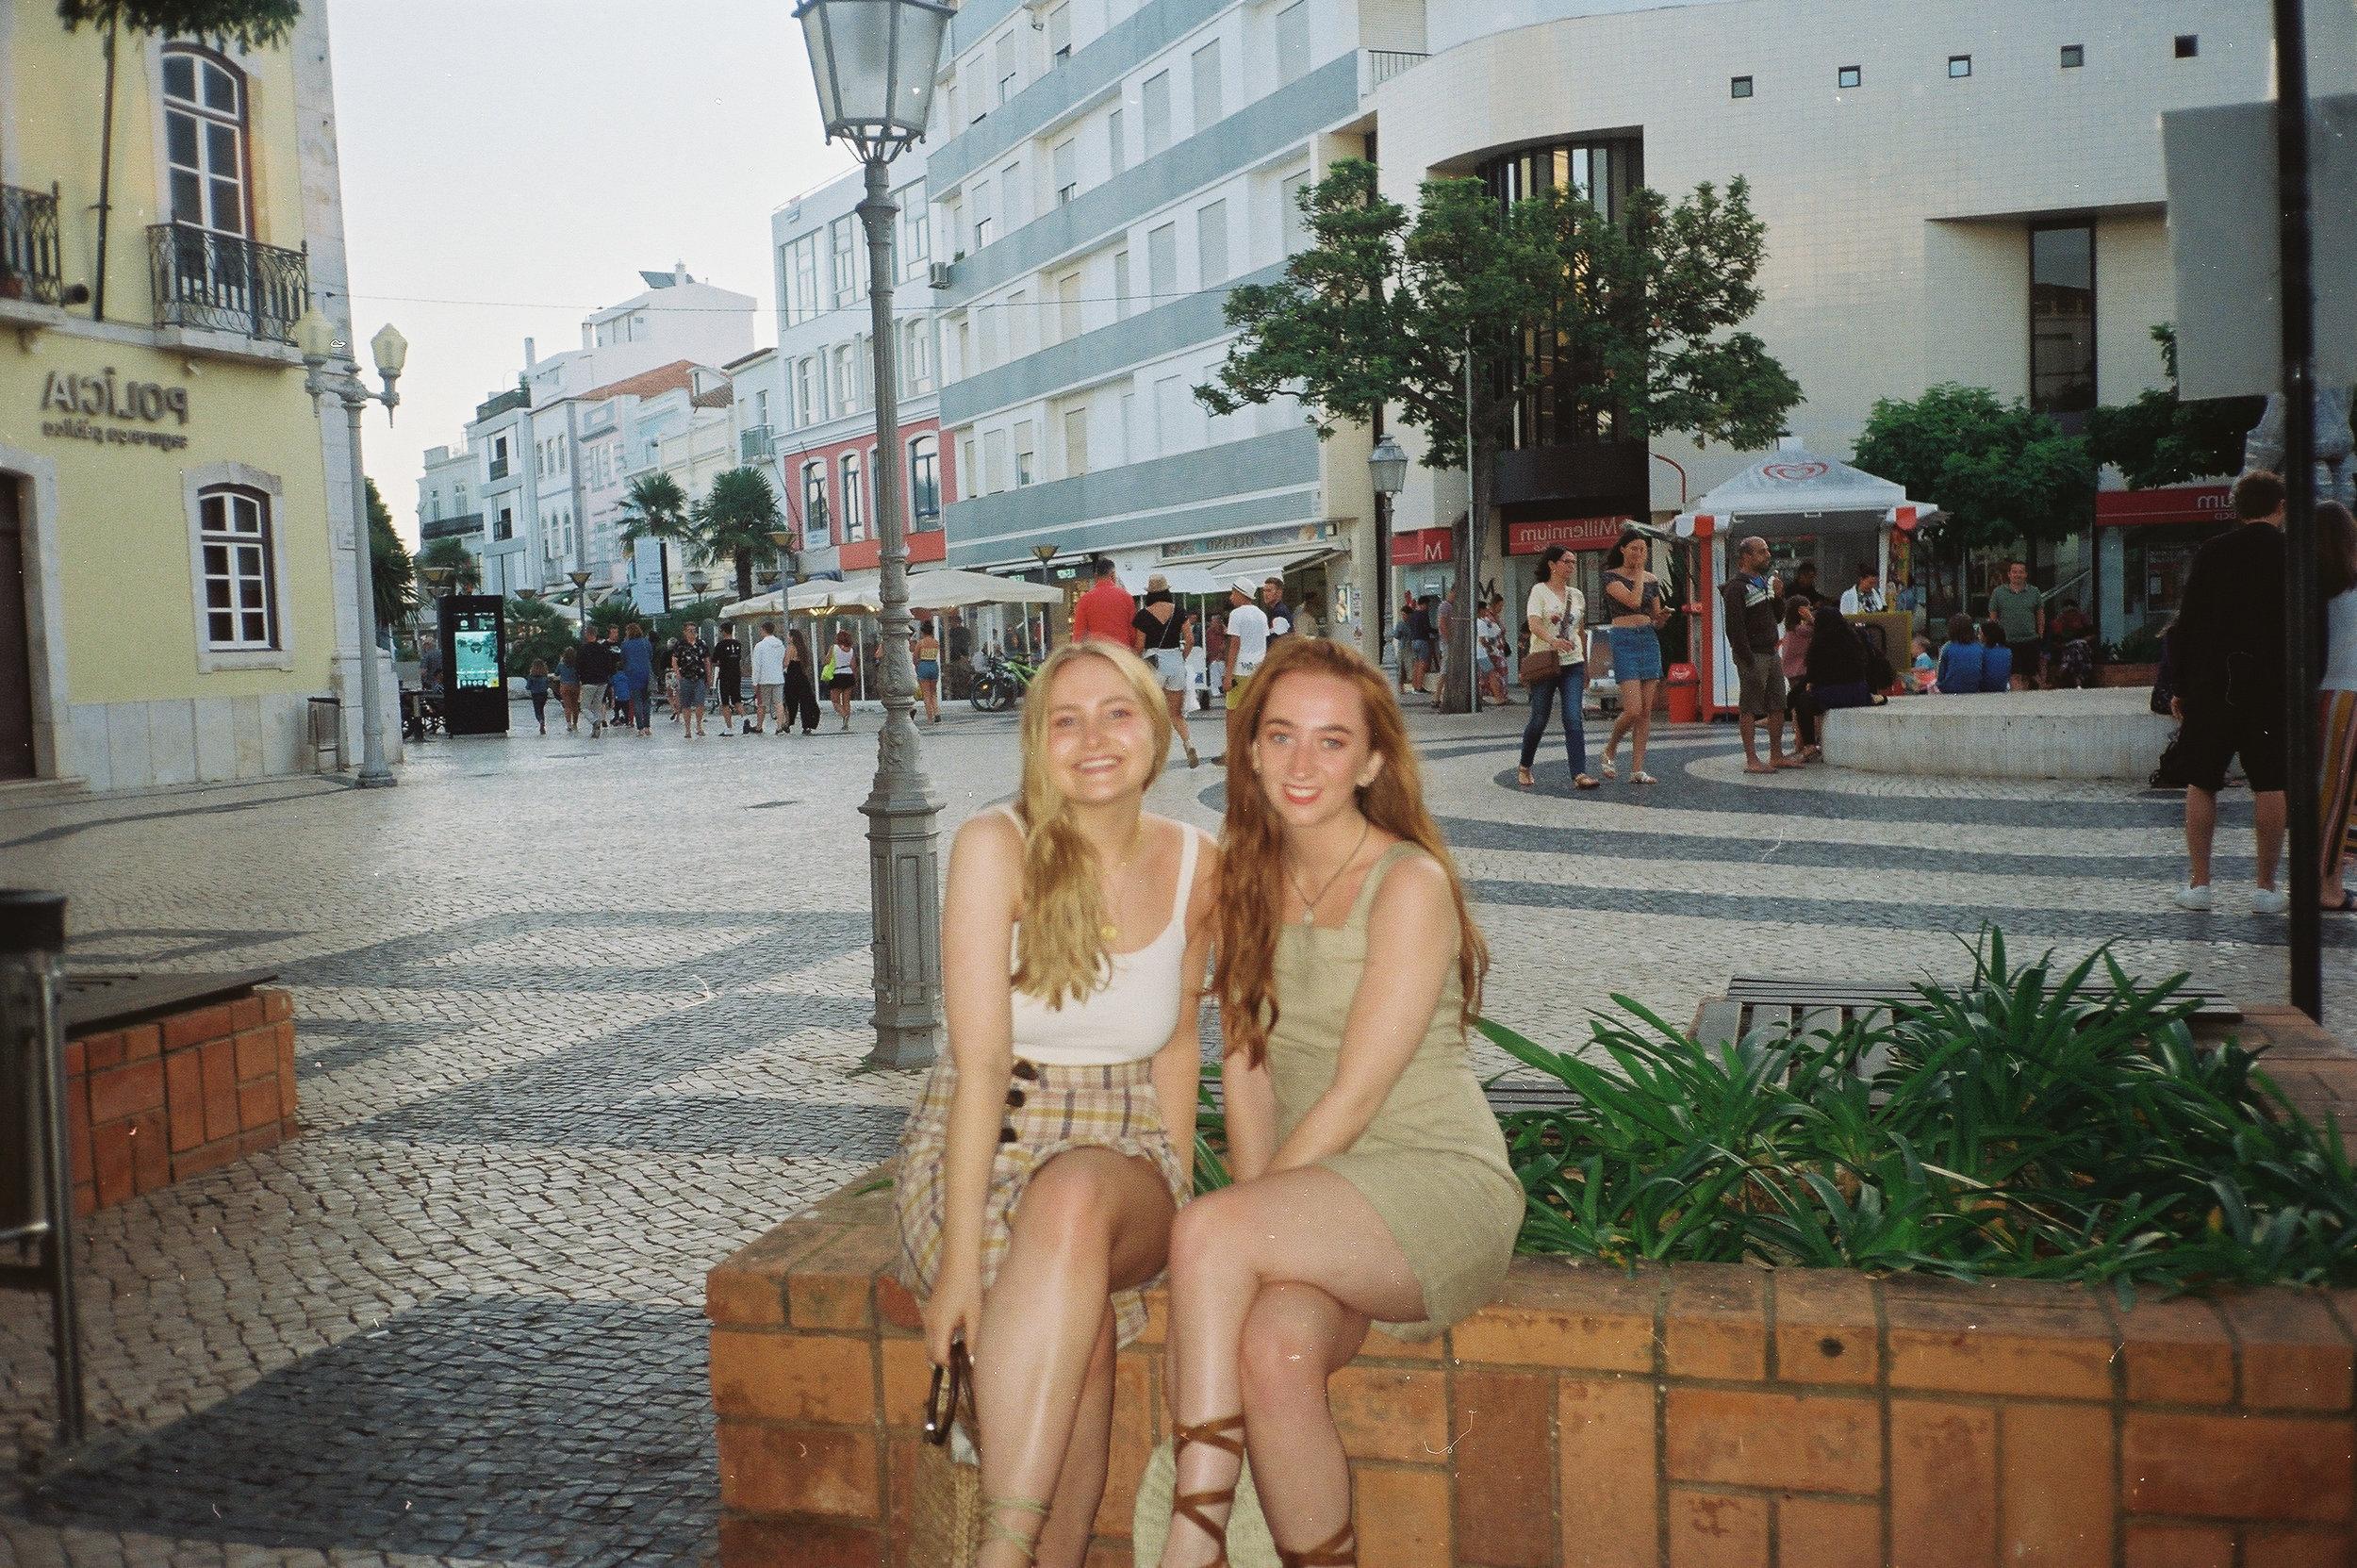 a-girls-trip-to-portugal-on-35mm-film25.jpg